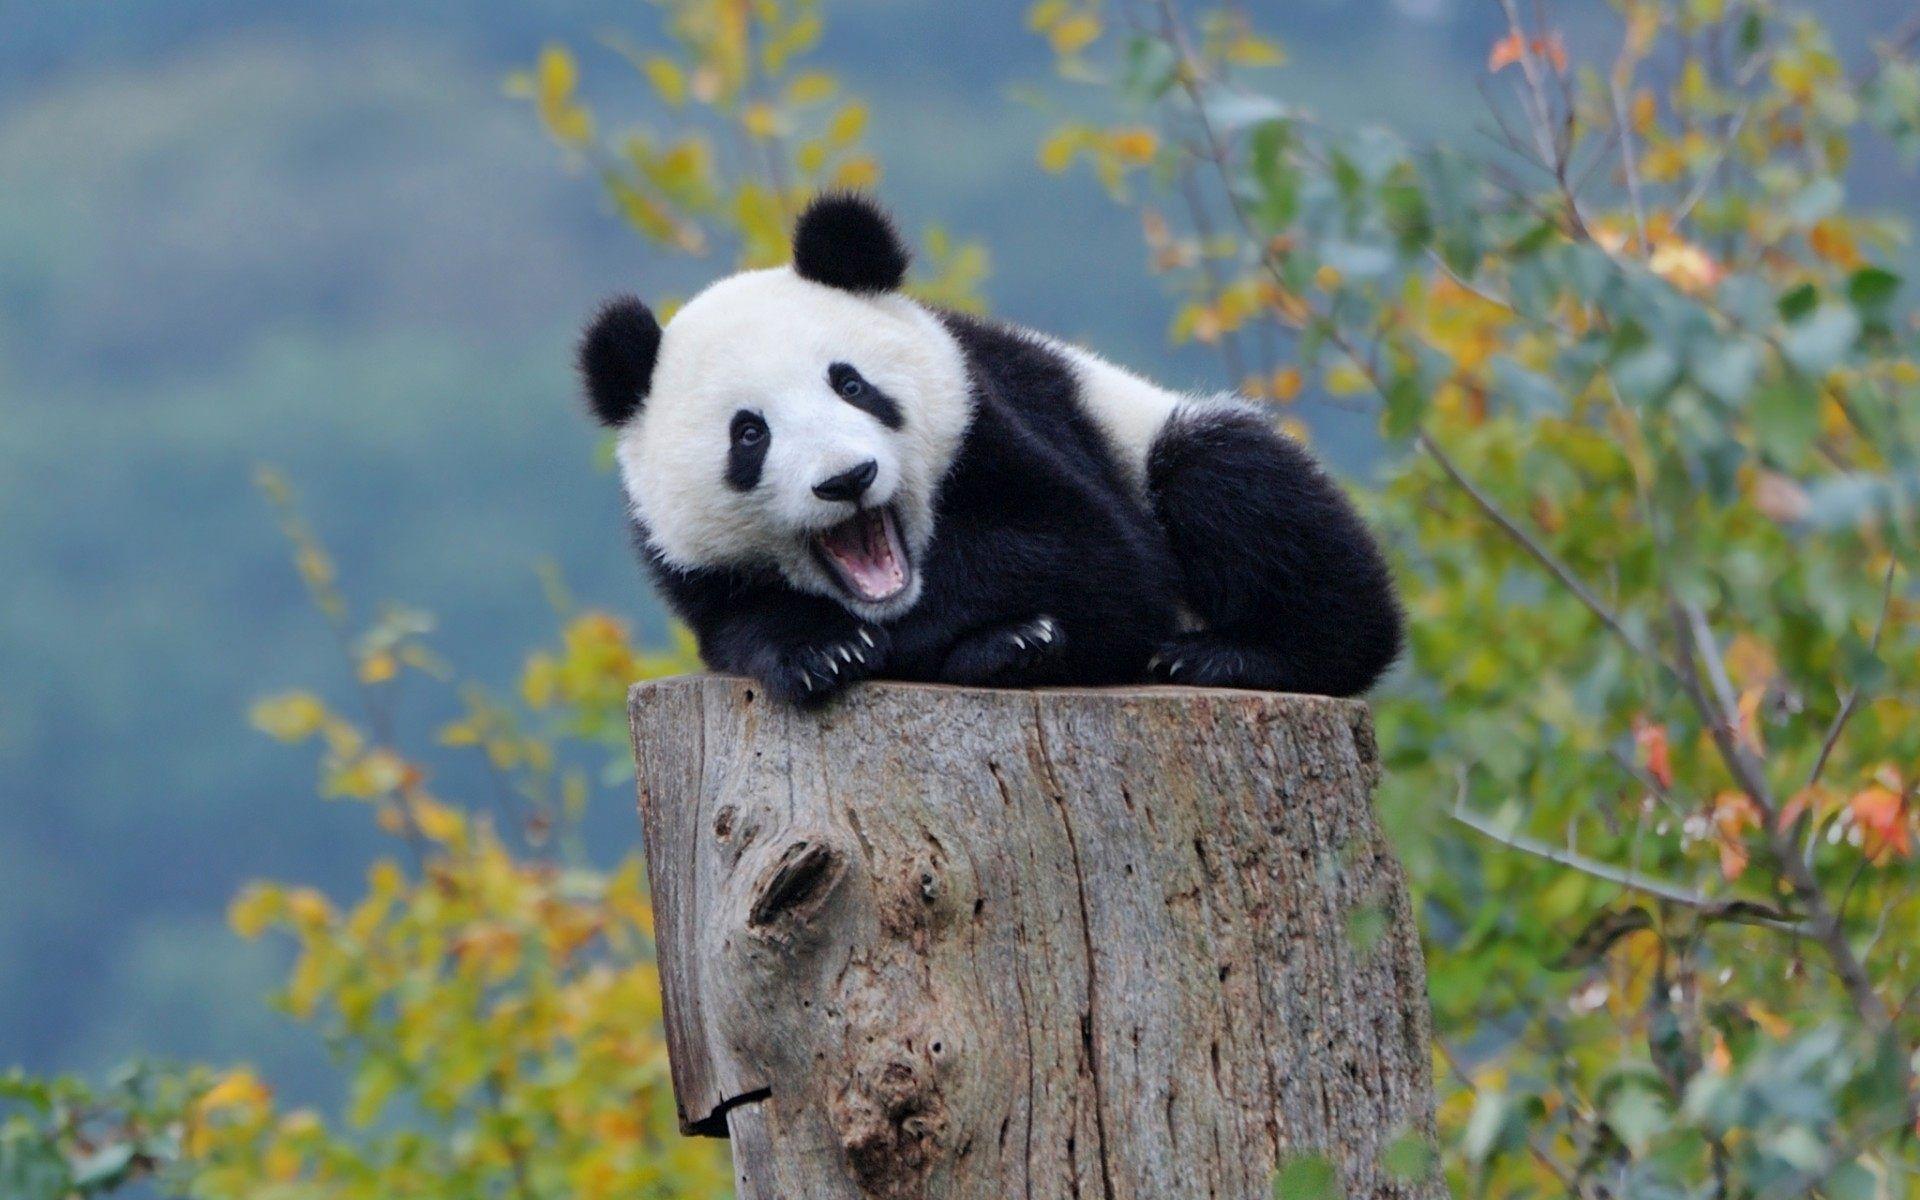 Cute Baby Pandas Desktop Wallpapers Top Free Cute Baby Pandas Desktop Backgrounds Wallpaperaccess